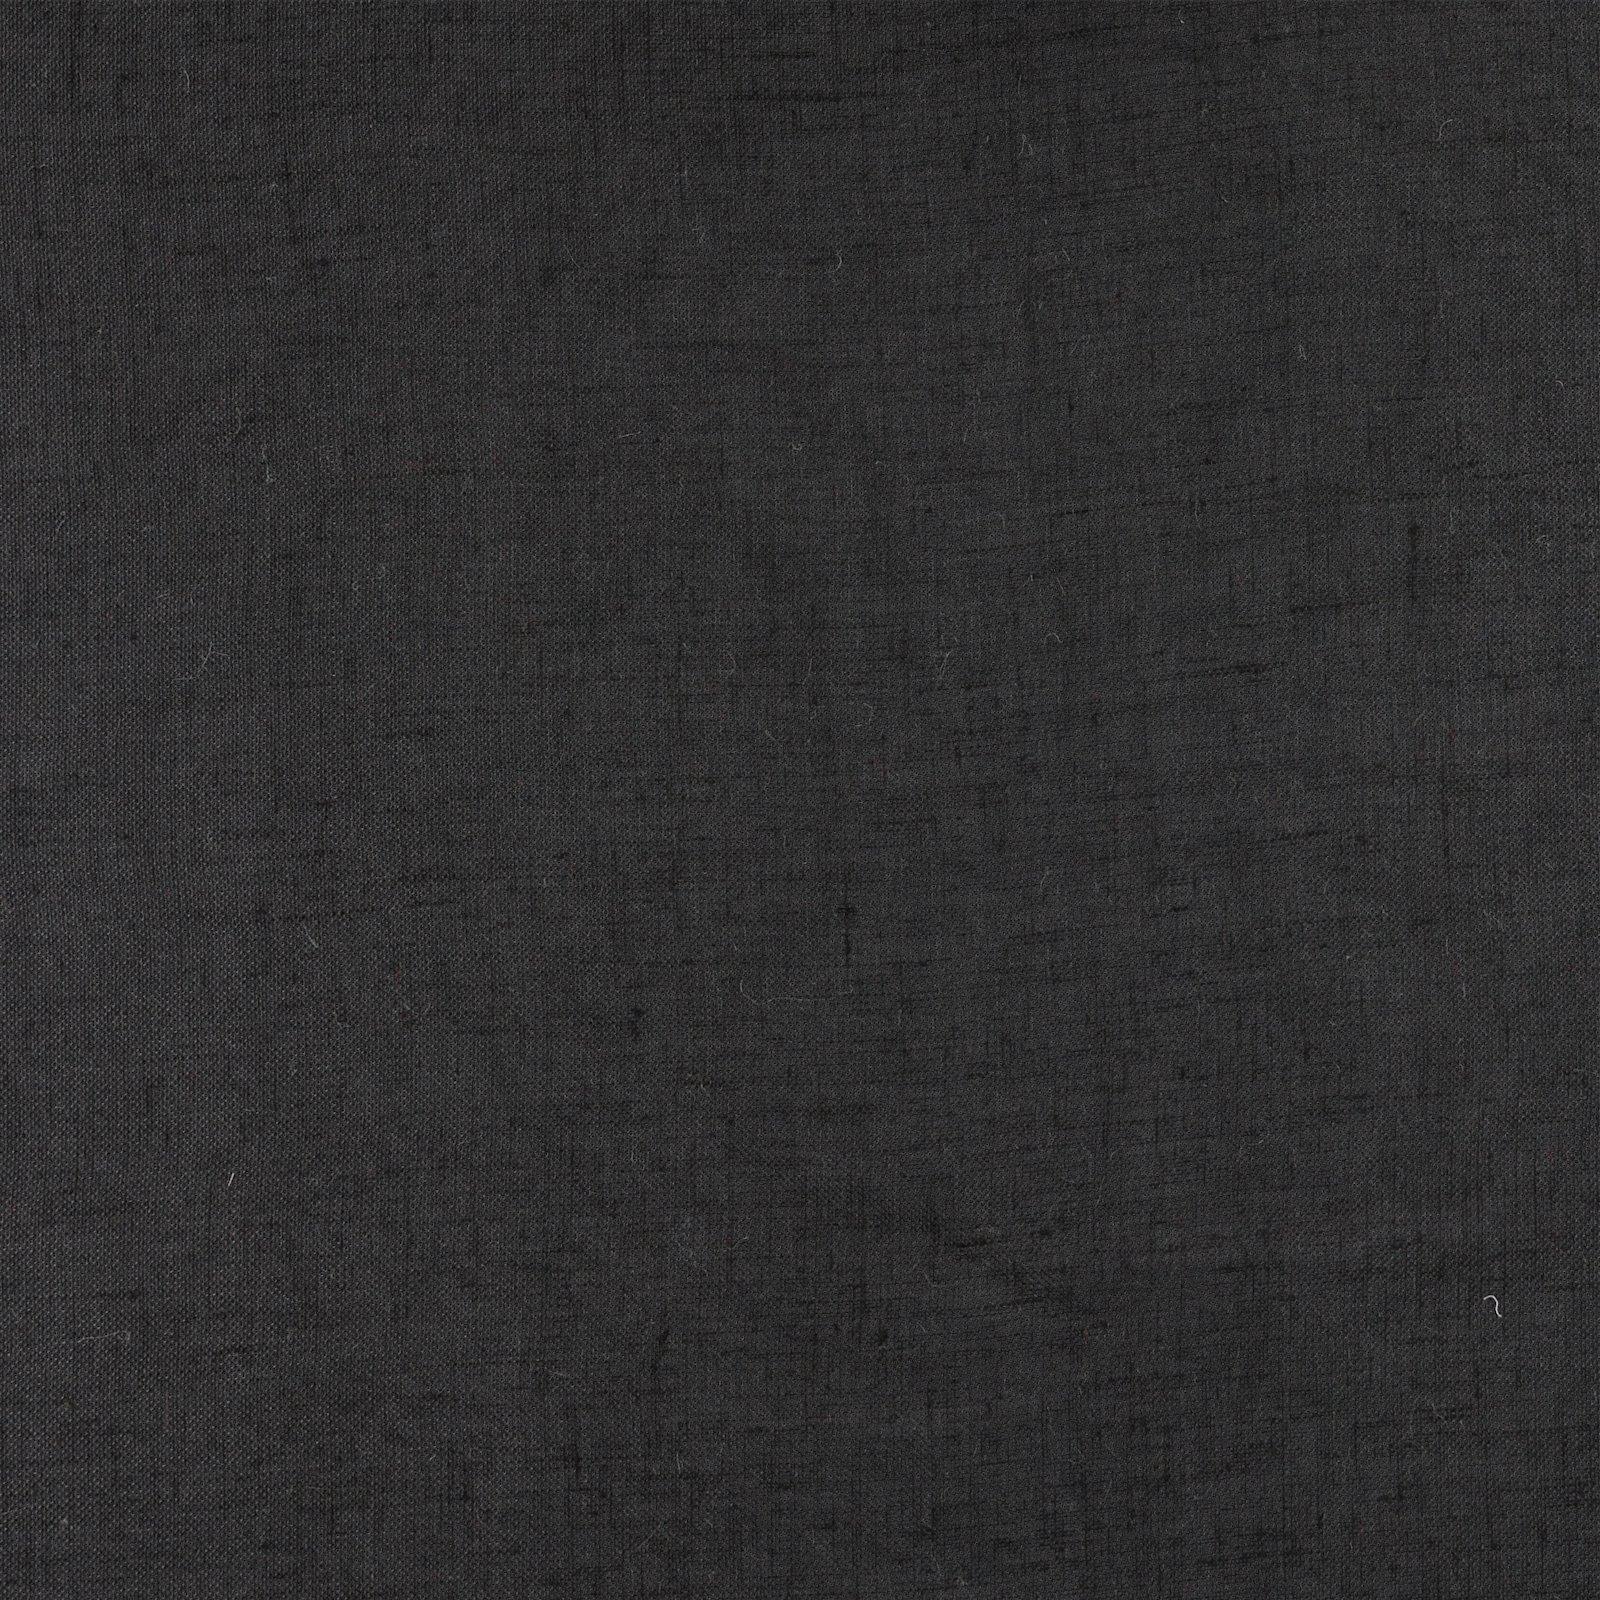 Hessian charcoal grey